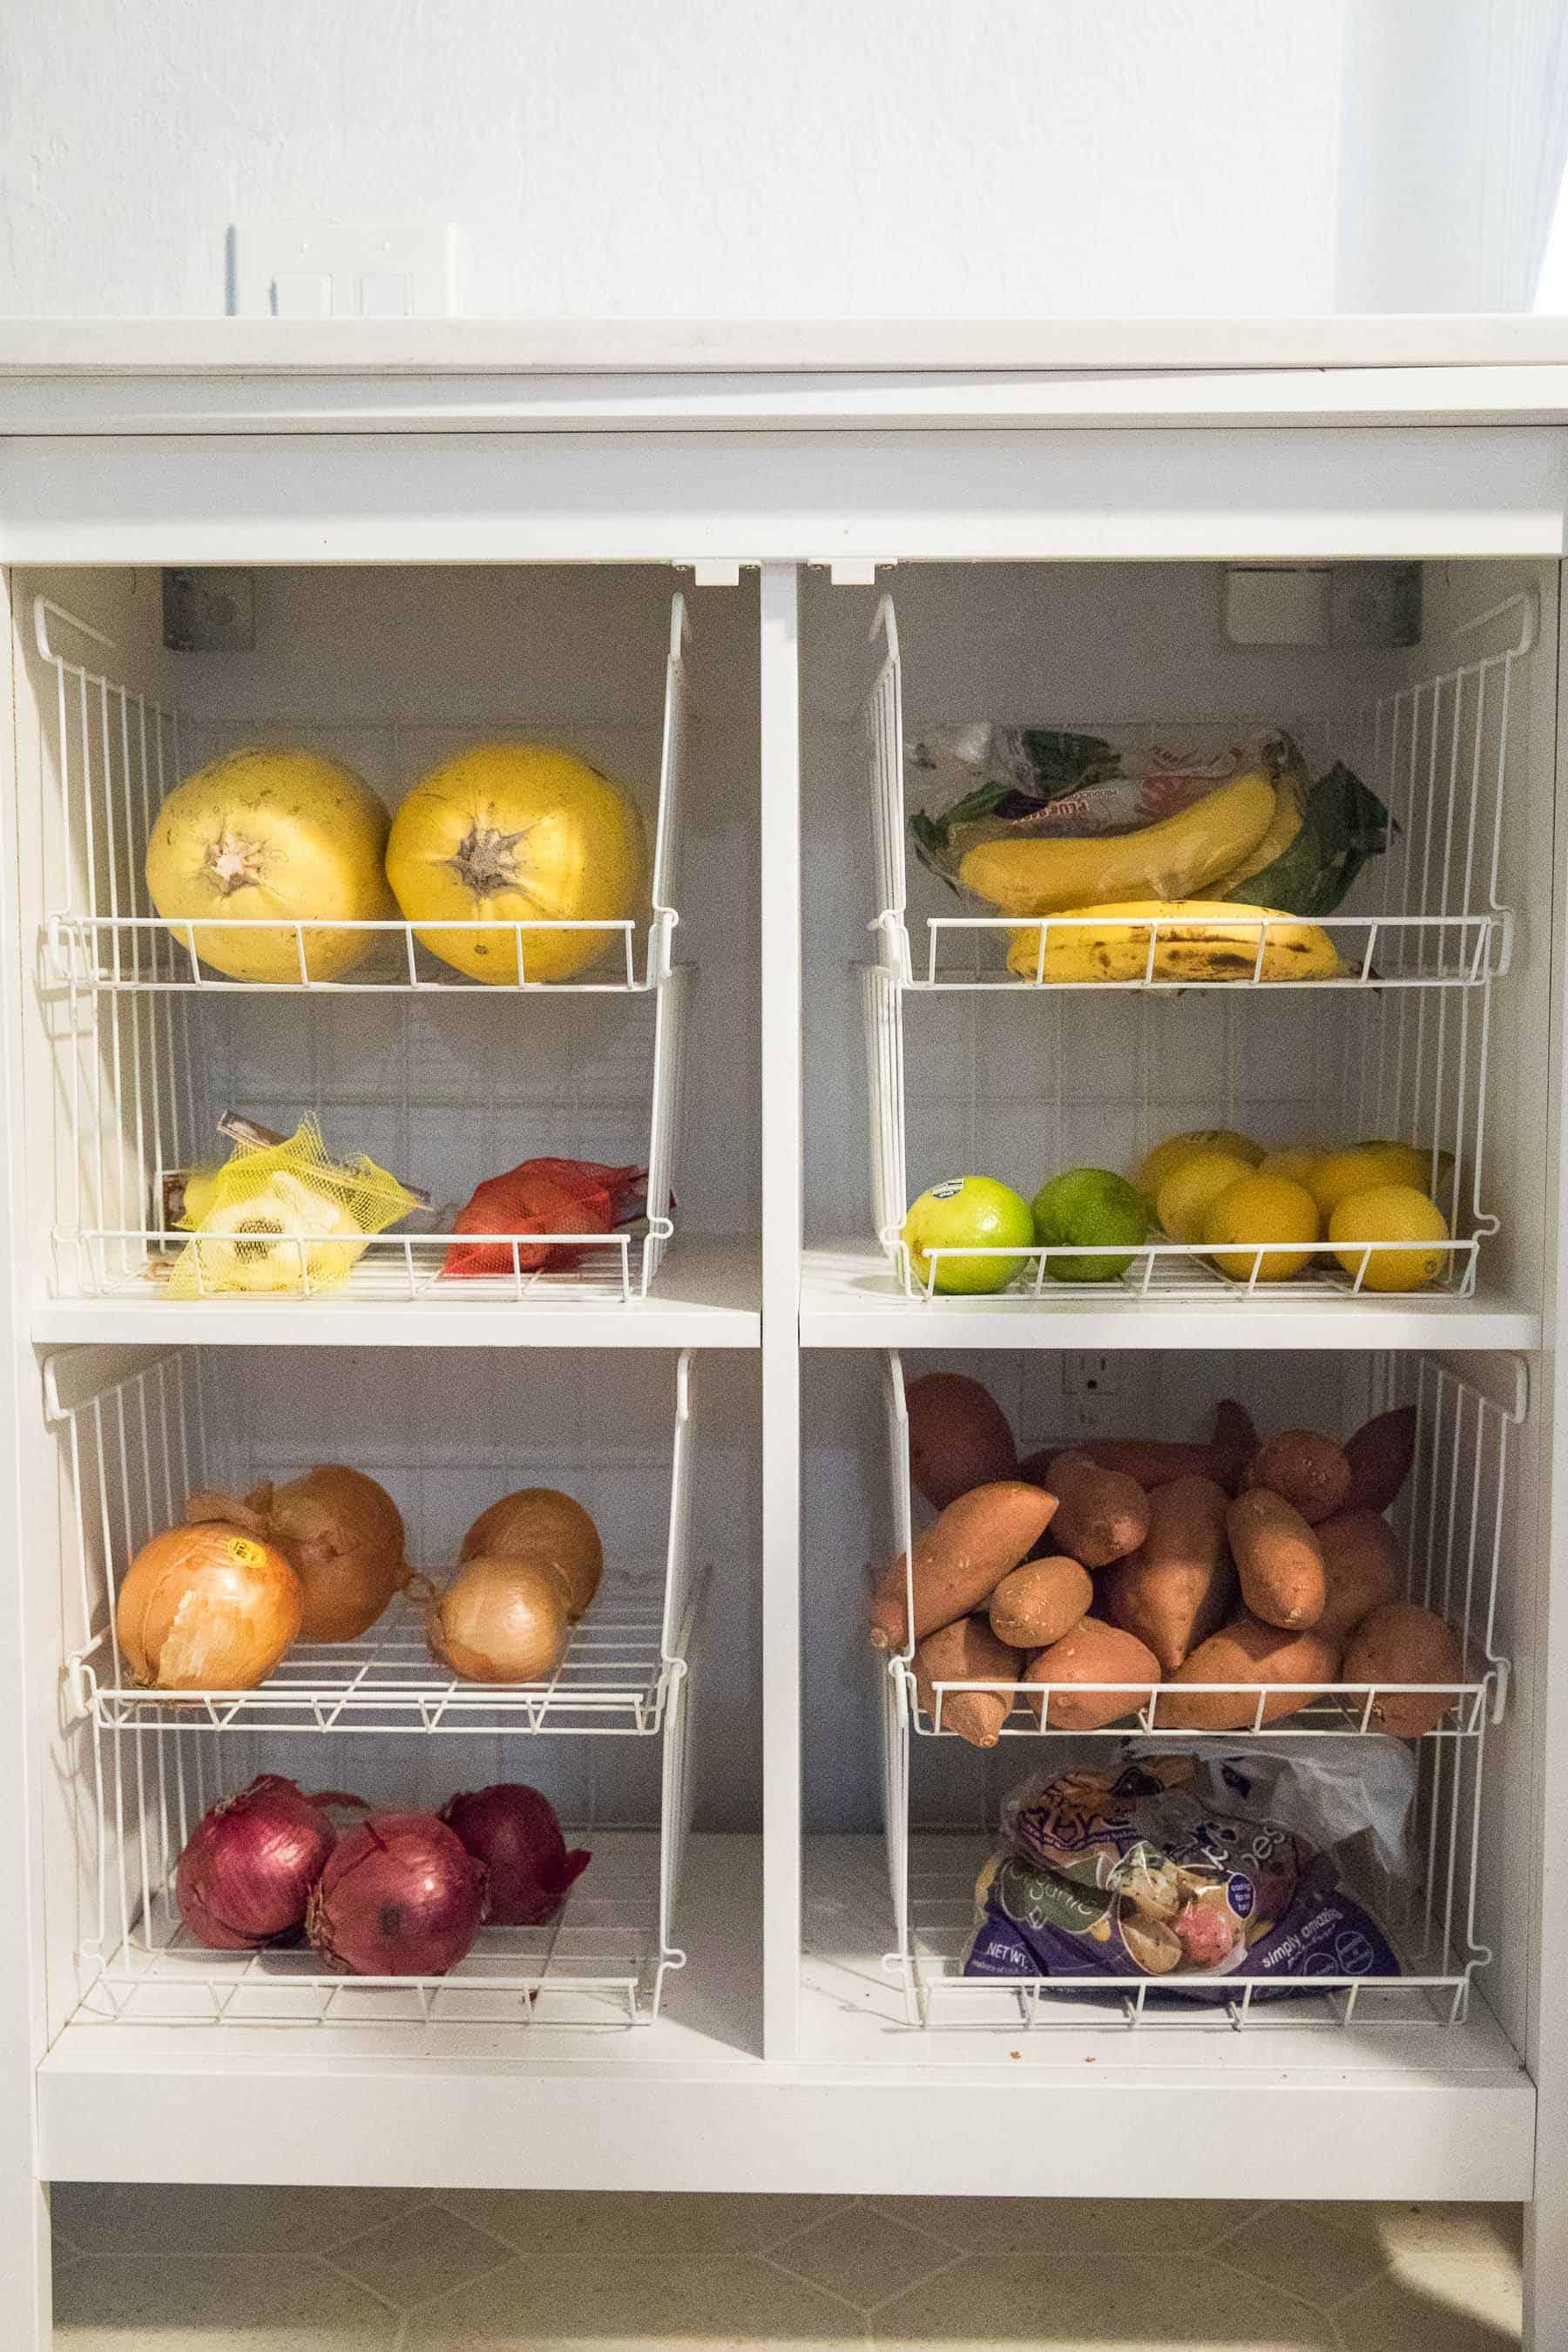 Dry produce whole30 stocked items